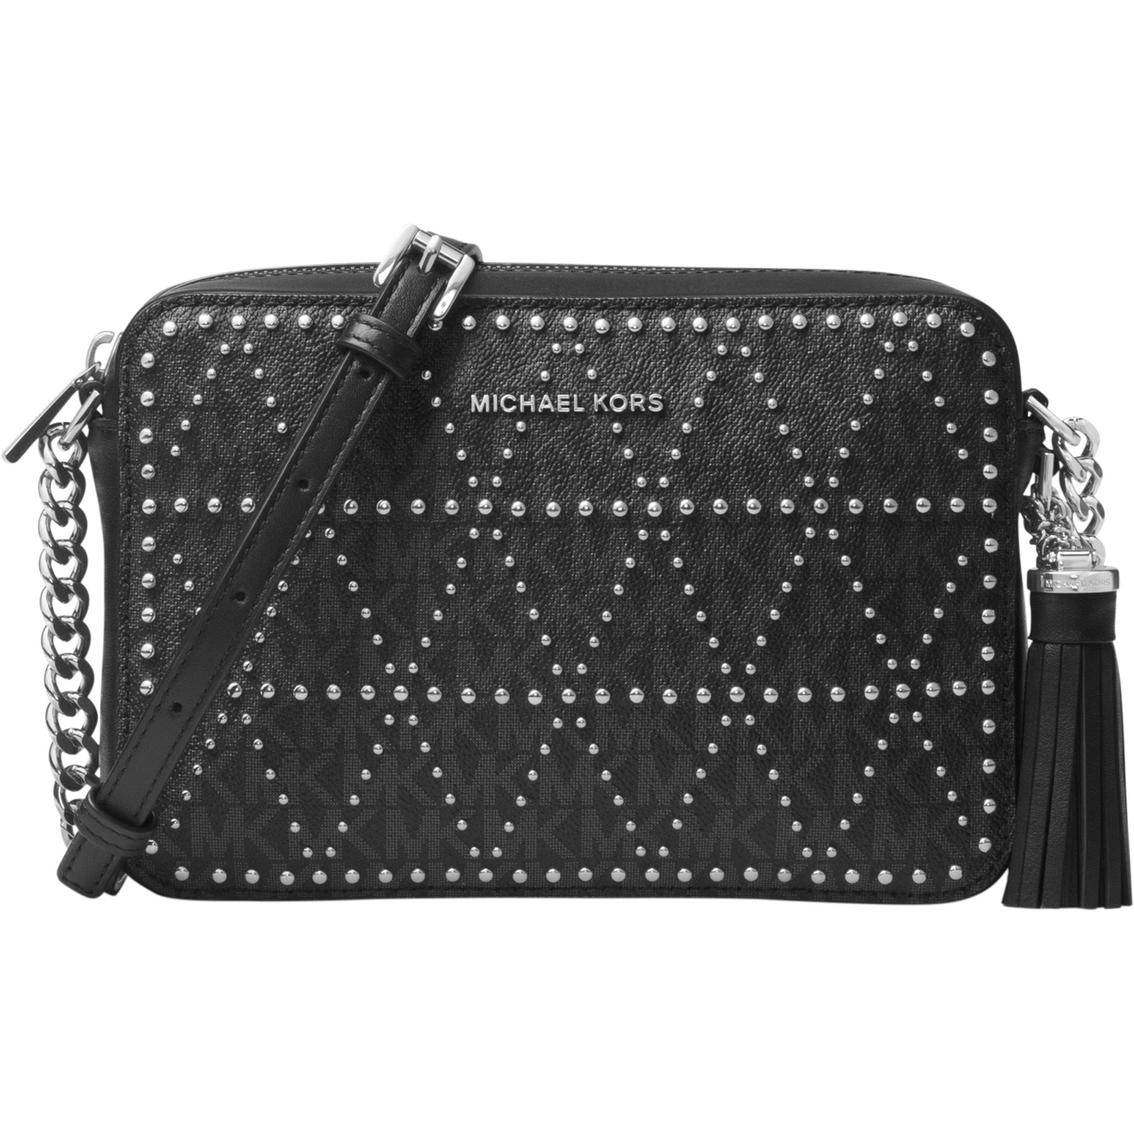 6b564fd10c Michael Kors Ginny Medium Camera Bag